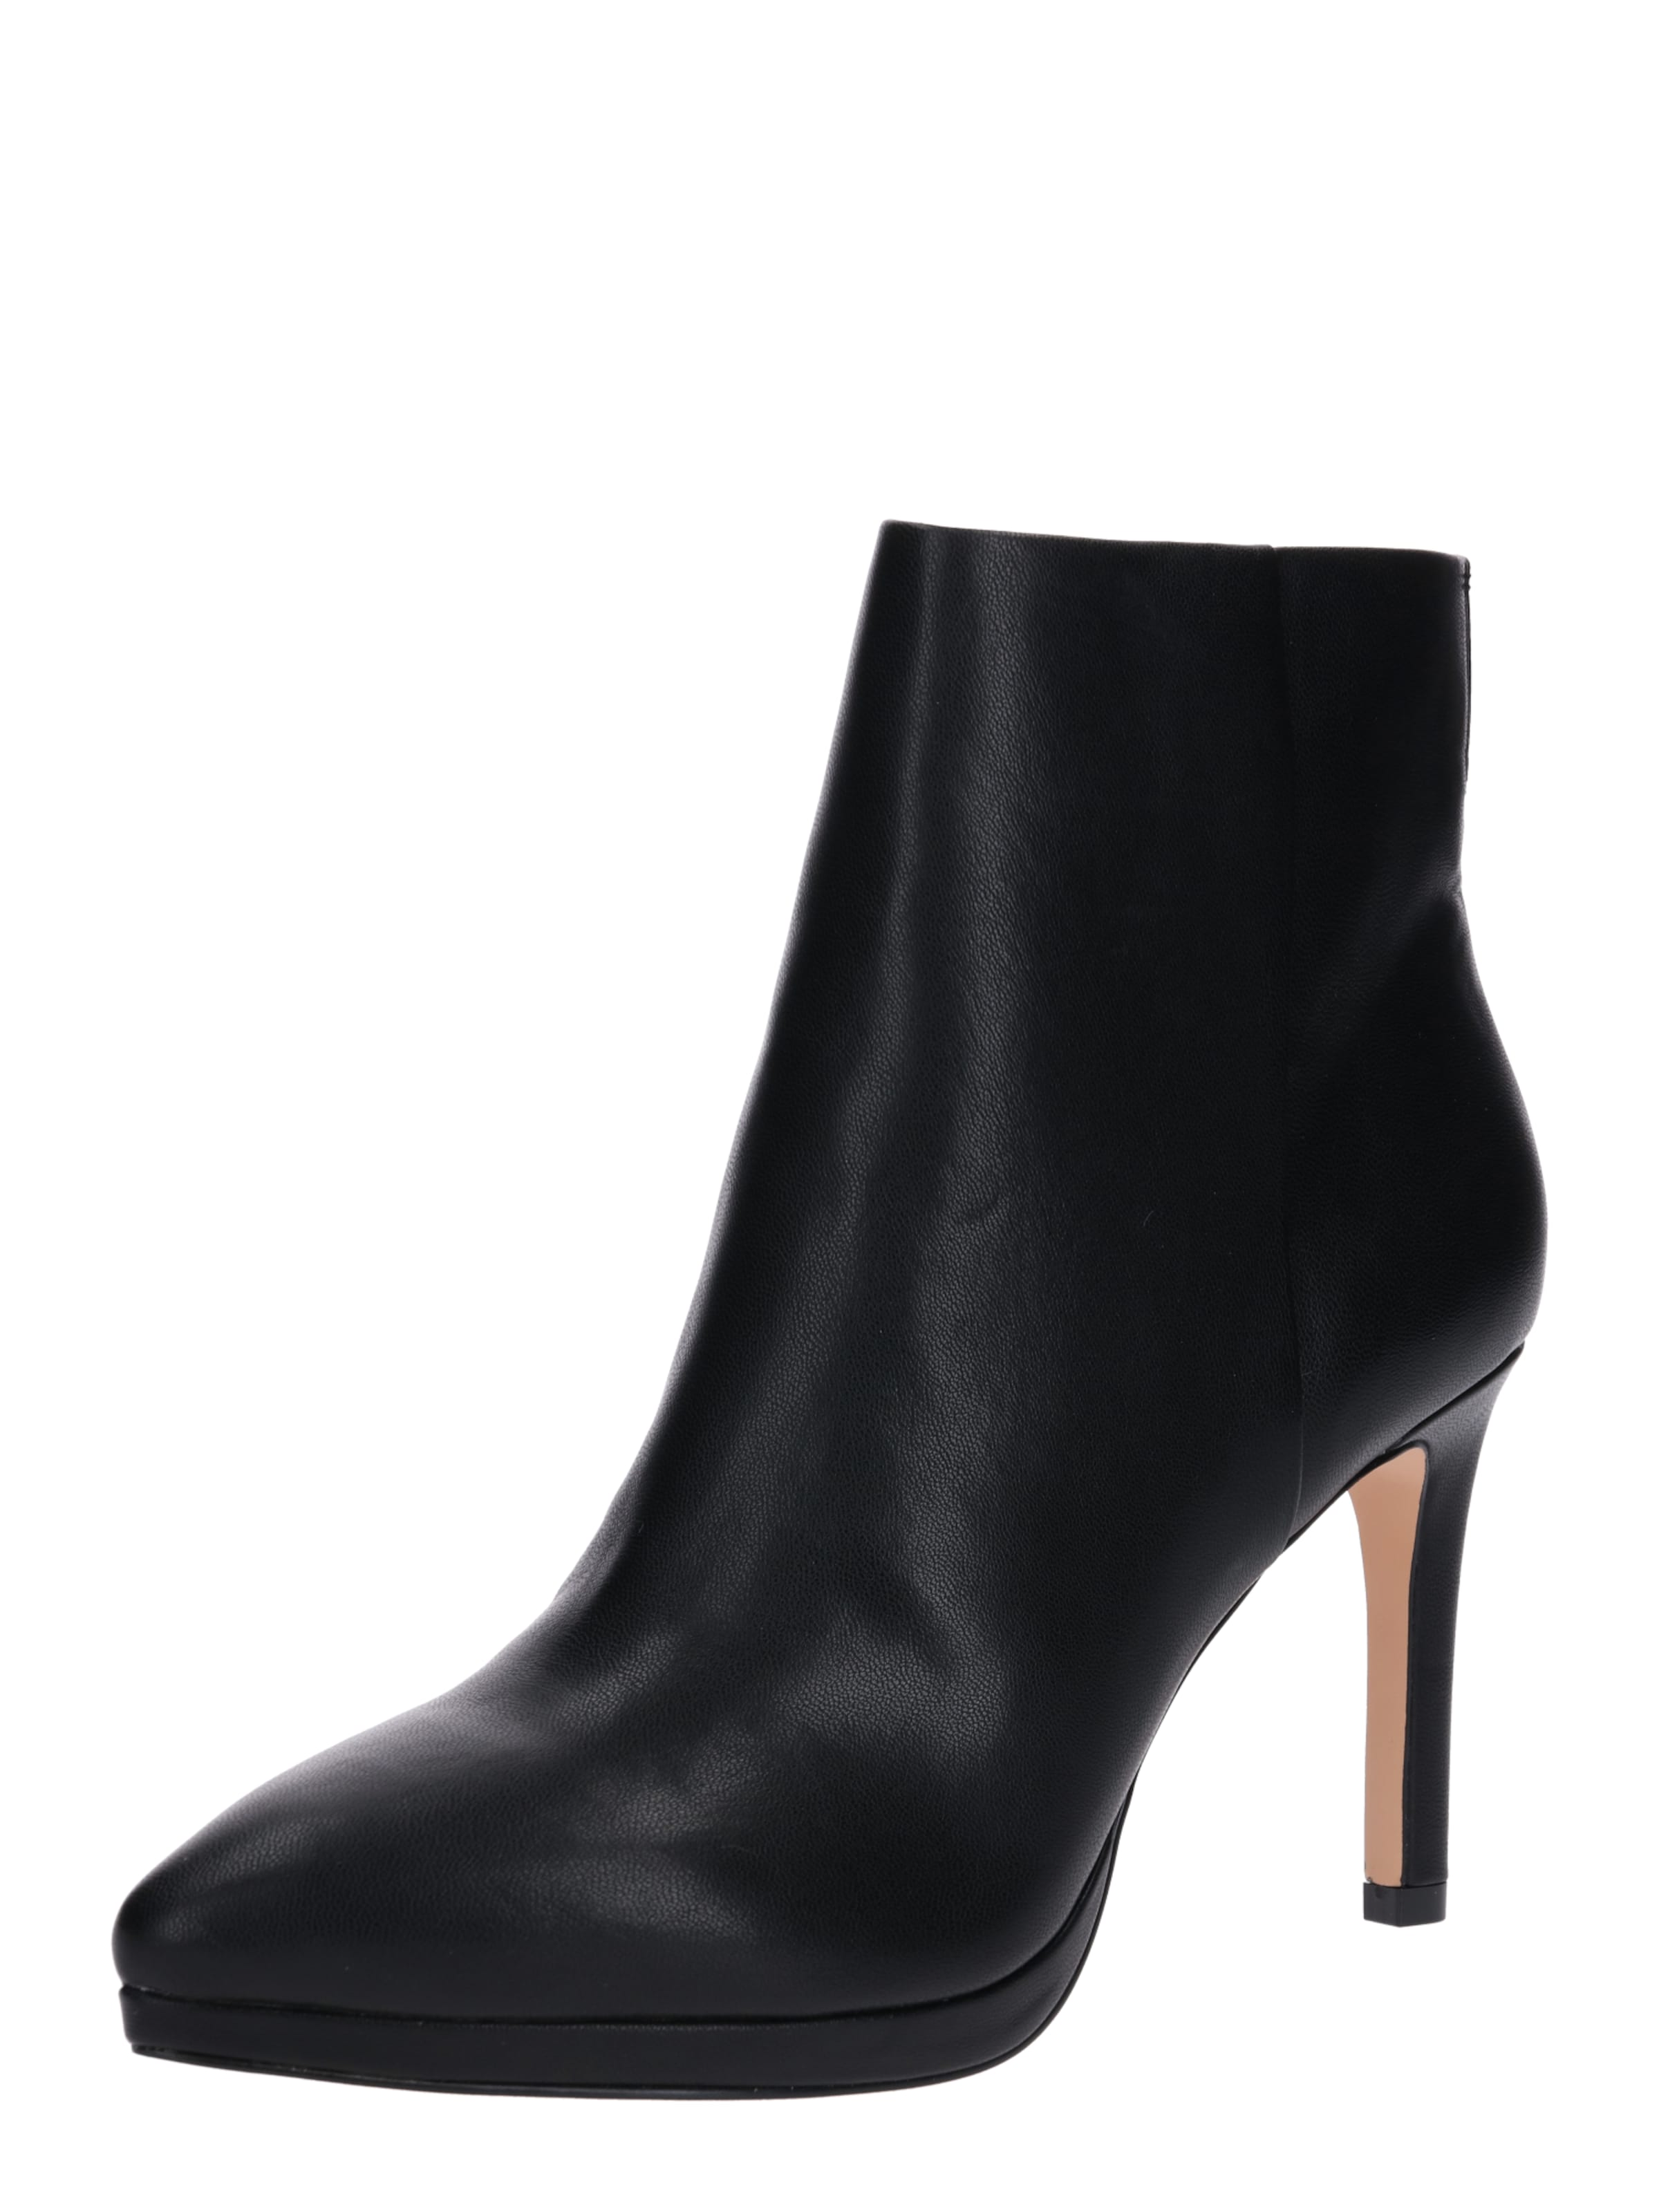 Boots Ankle 'fynnia' In Buffalo Schwarz tQdCsxhr